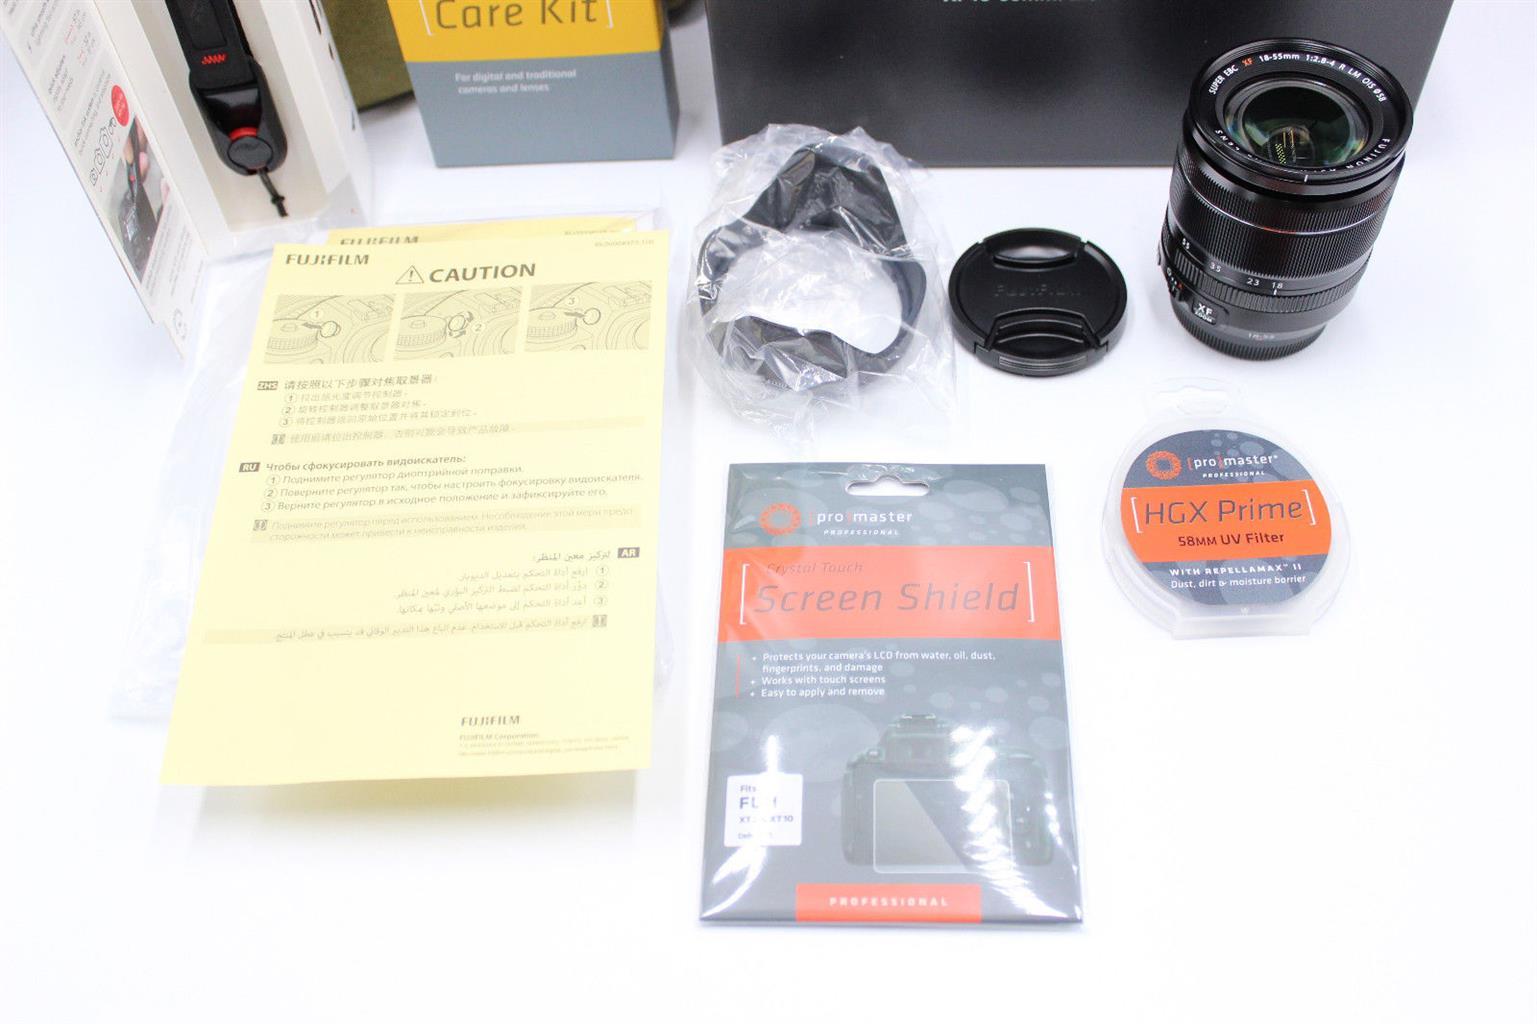 Fujifilm xt3 bundle with 18-55mm lens